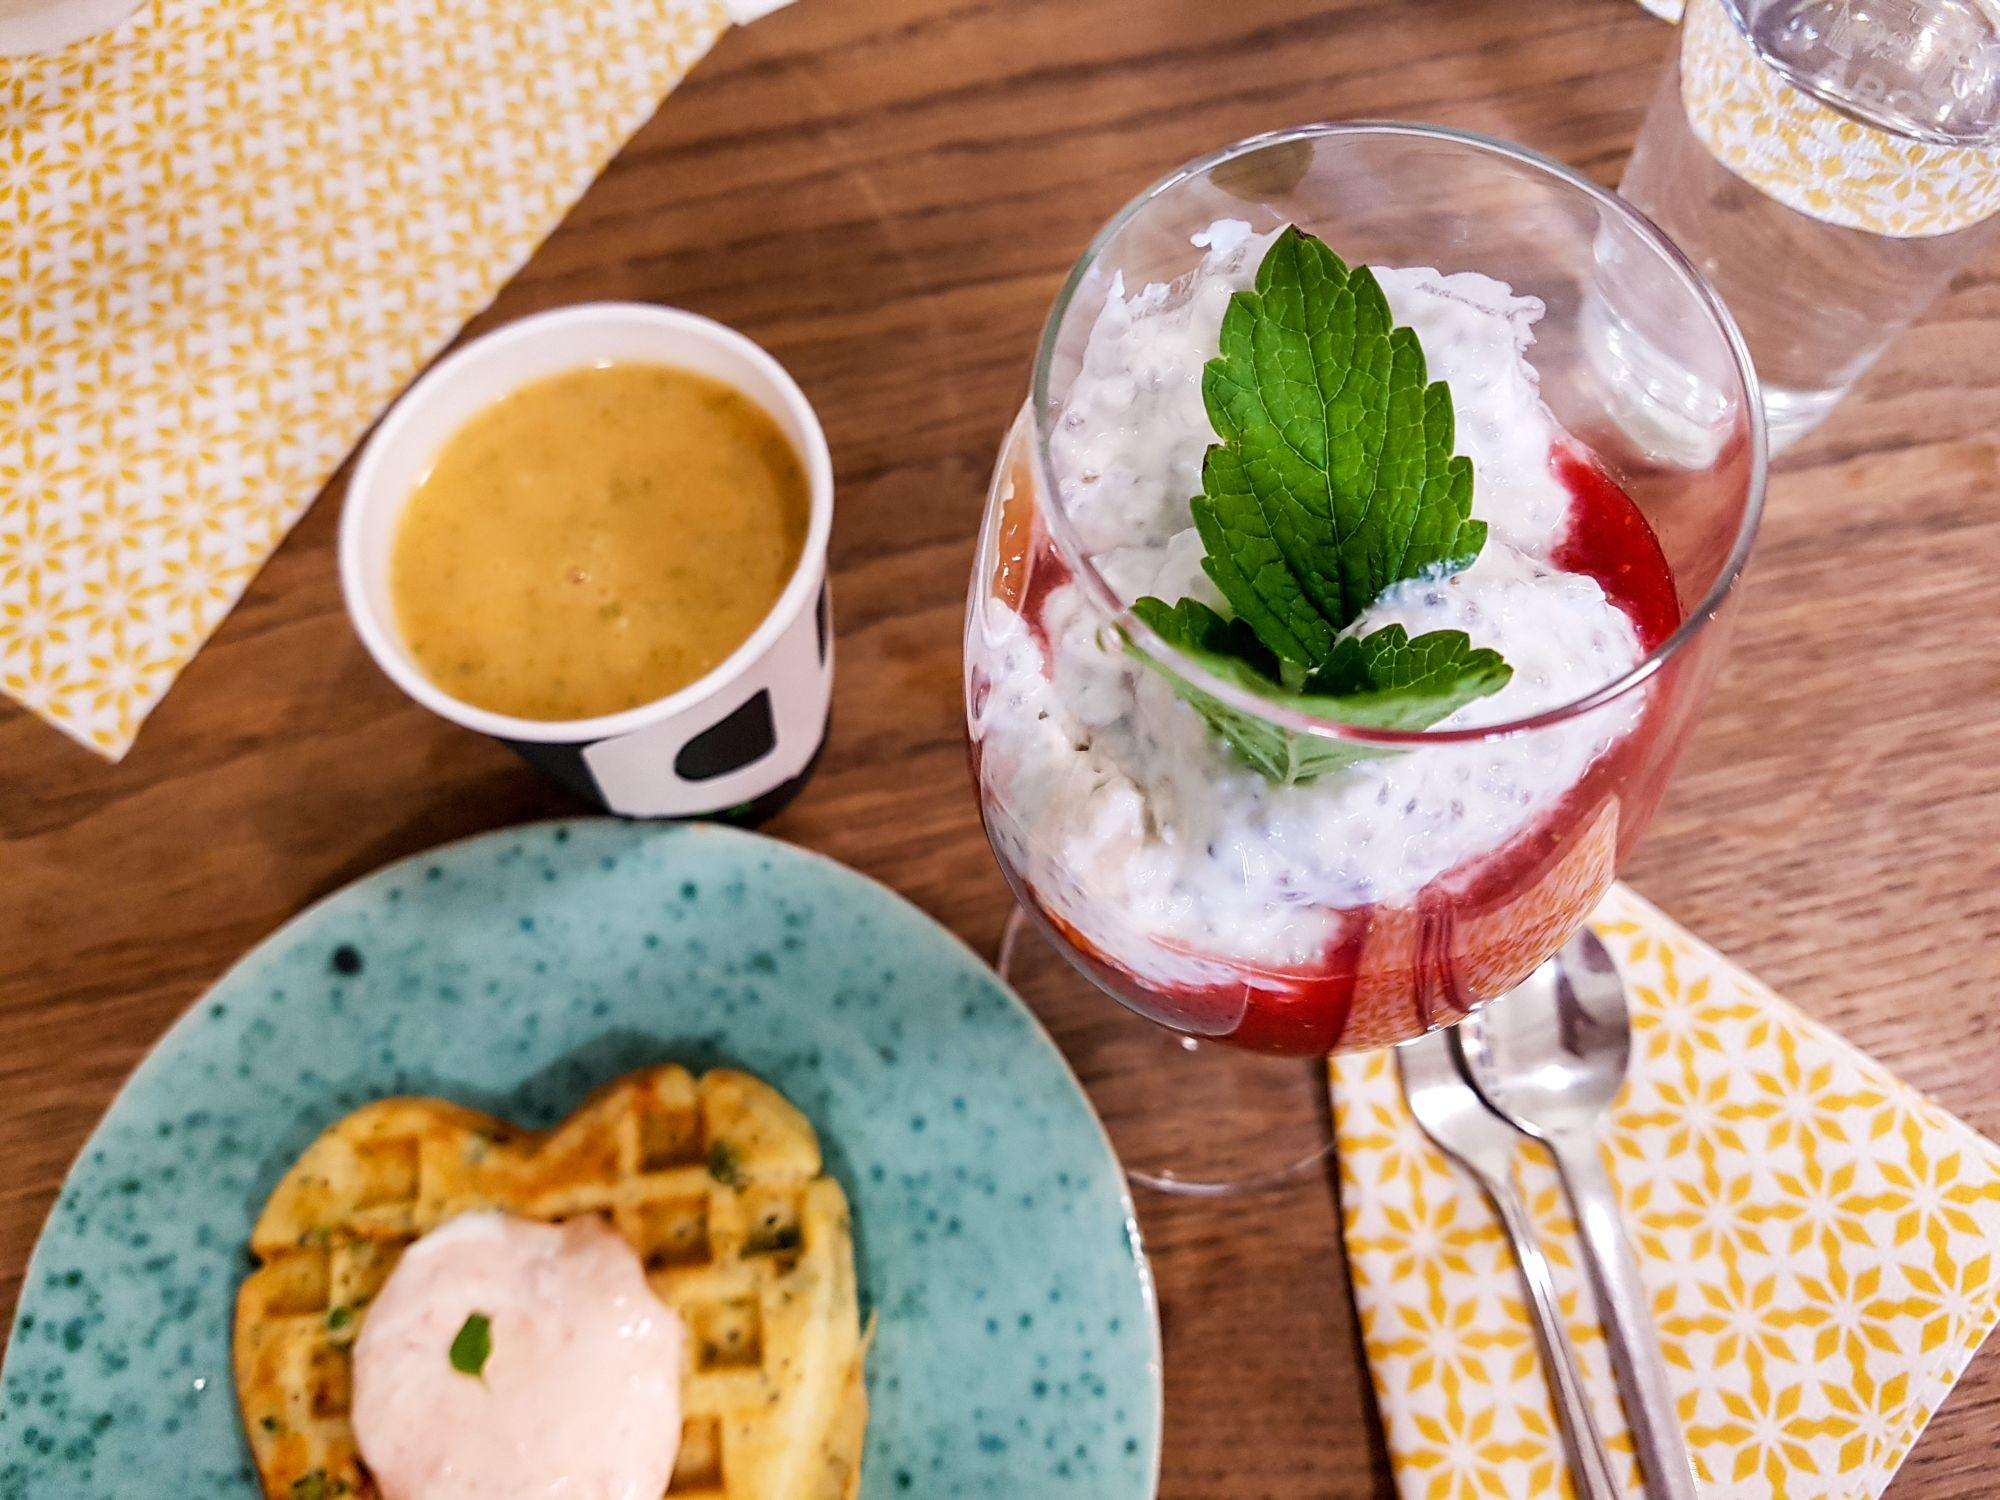 Erdbeer-Chia-Dessert als Abschluss (c) TravelWorldOnline Traveller